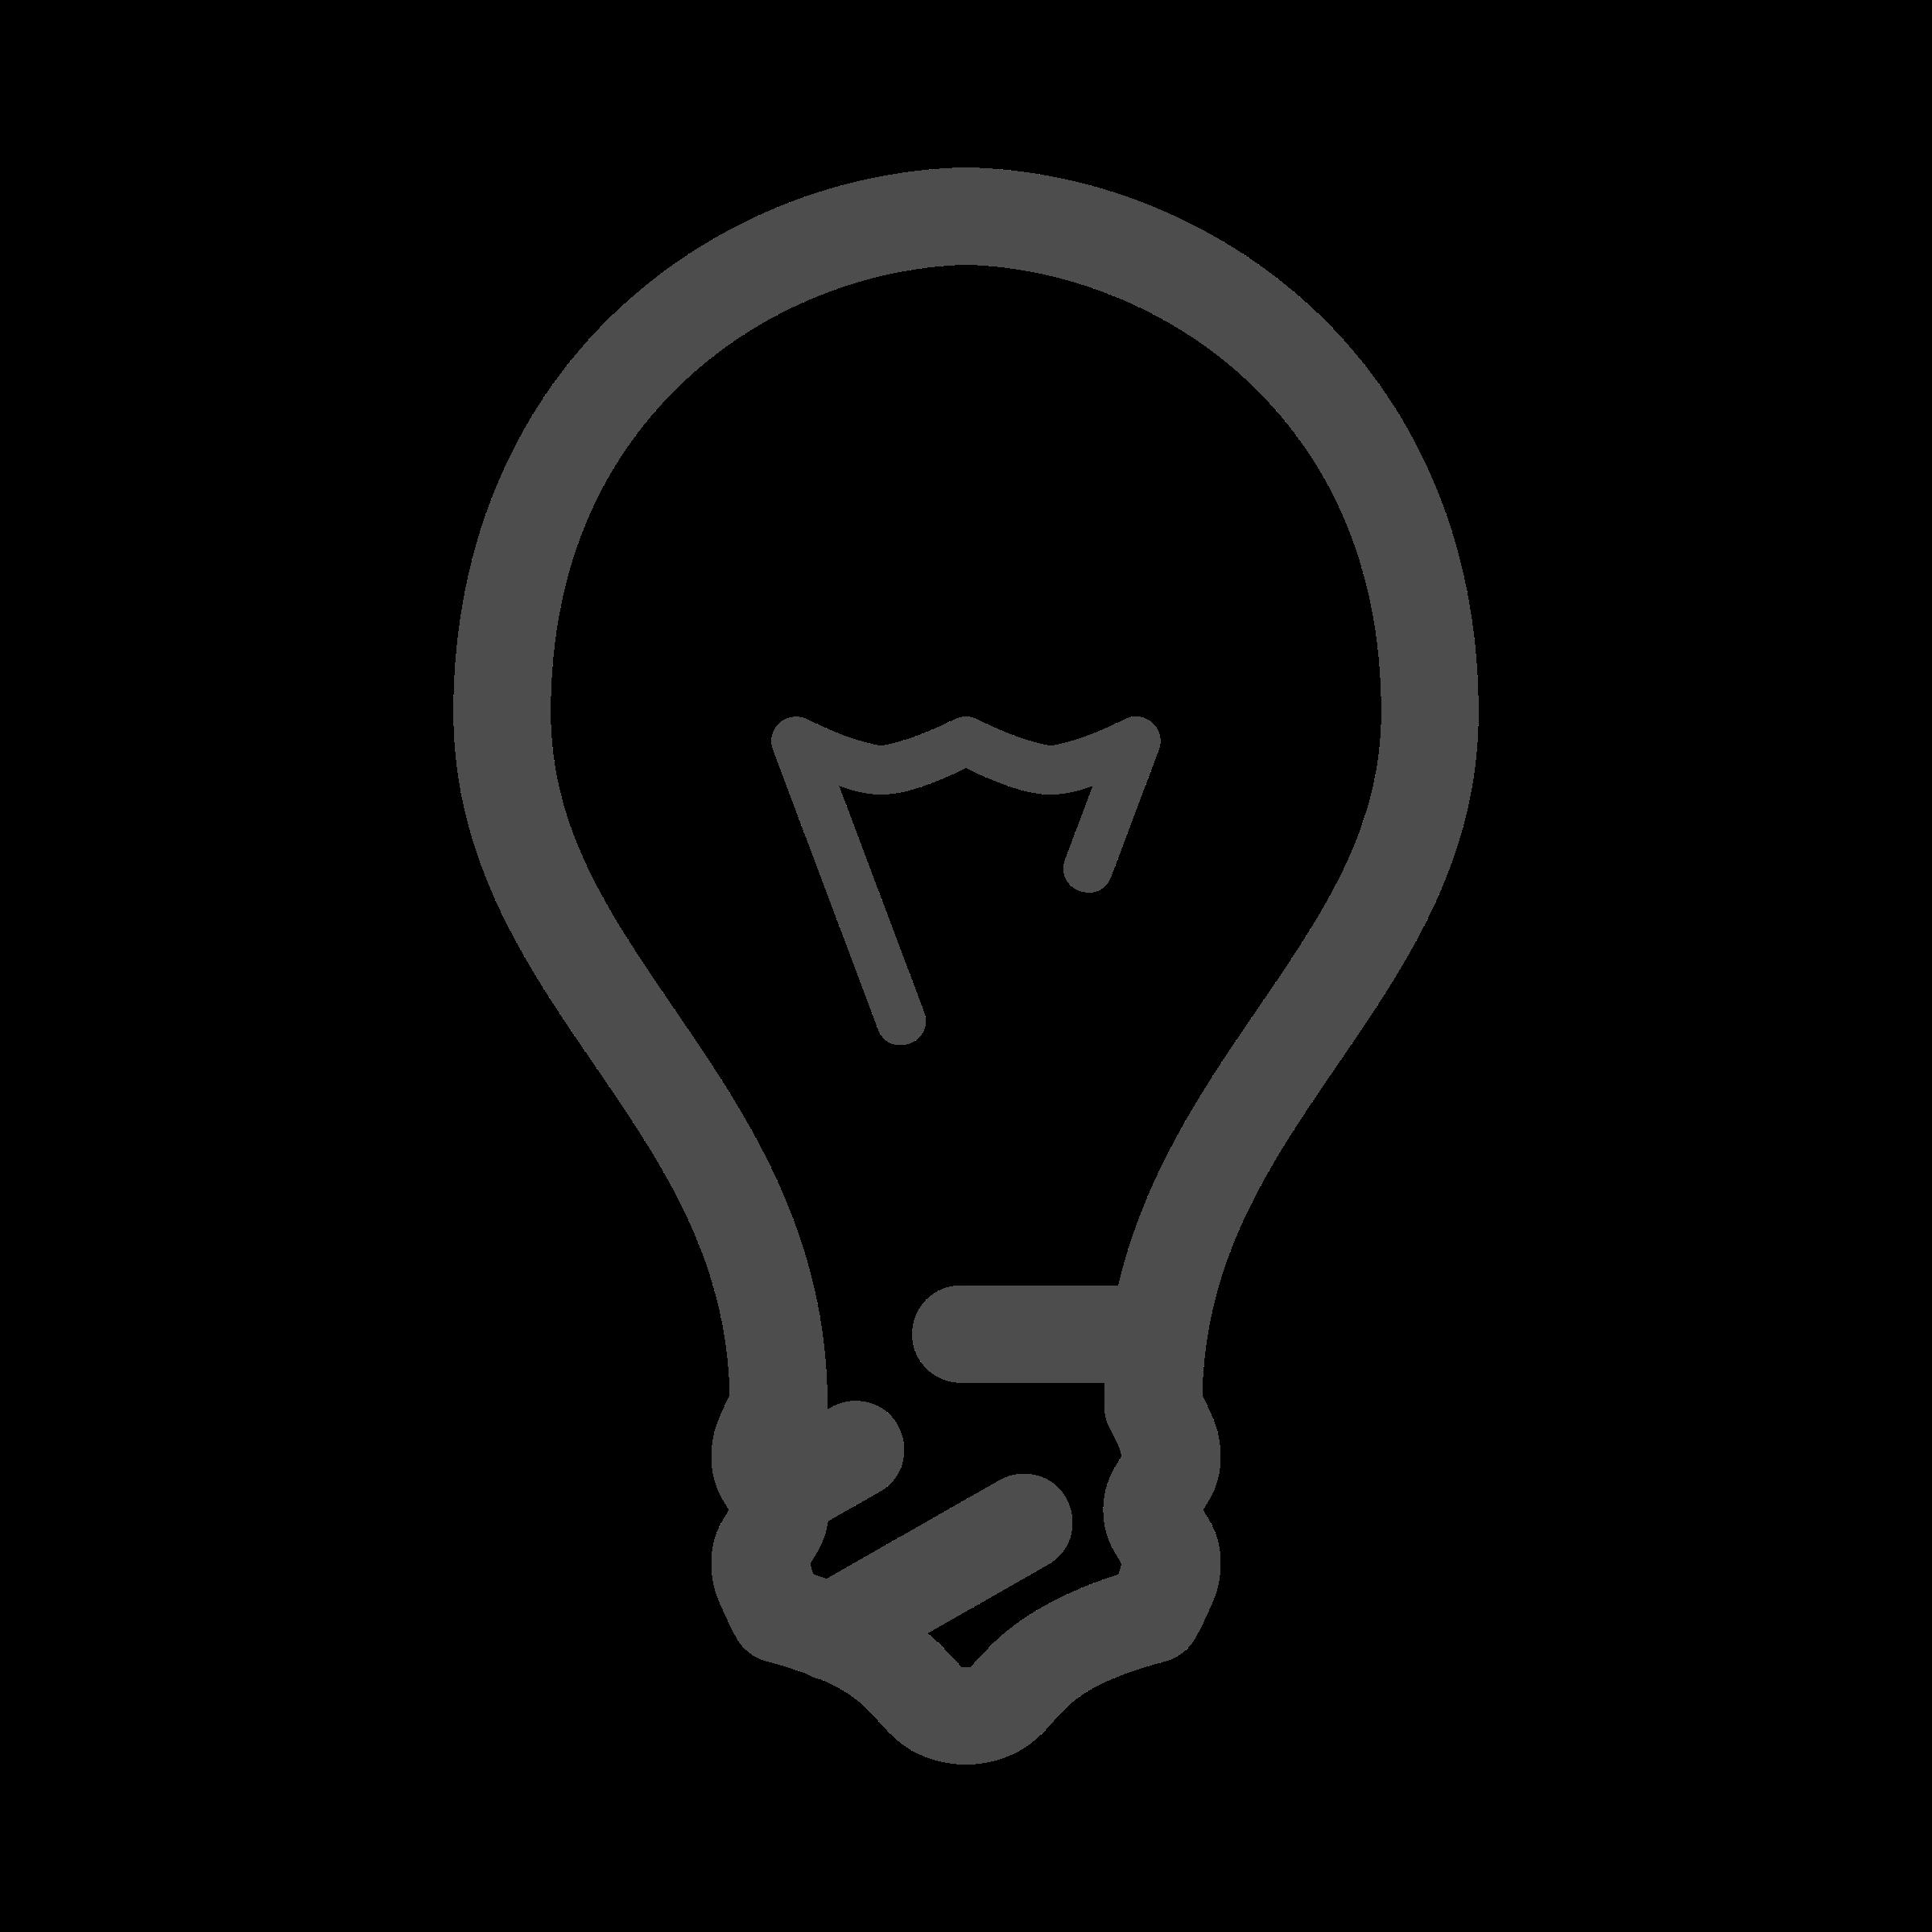 light bulb png. big image png light bulb png